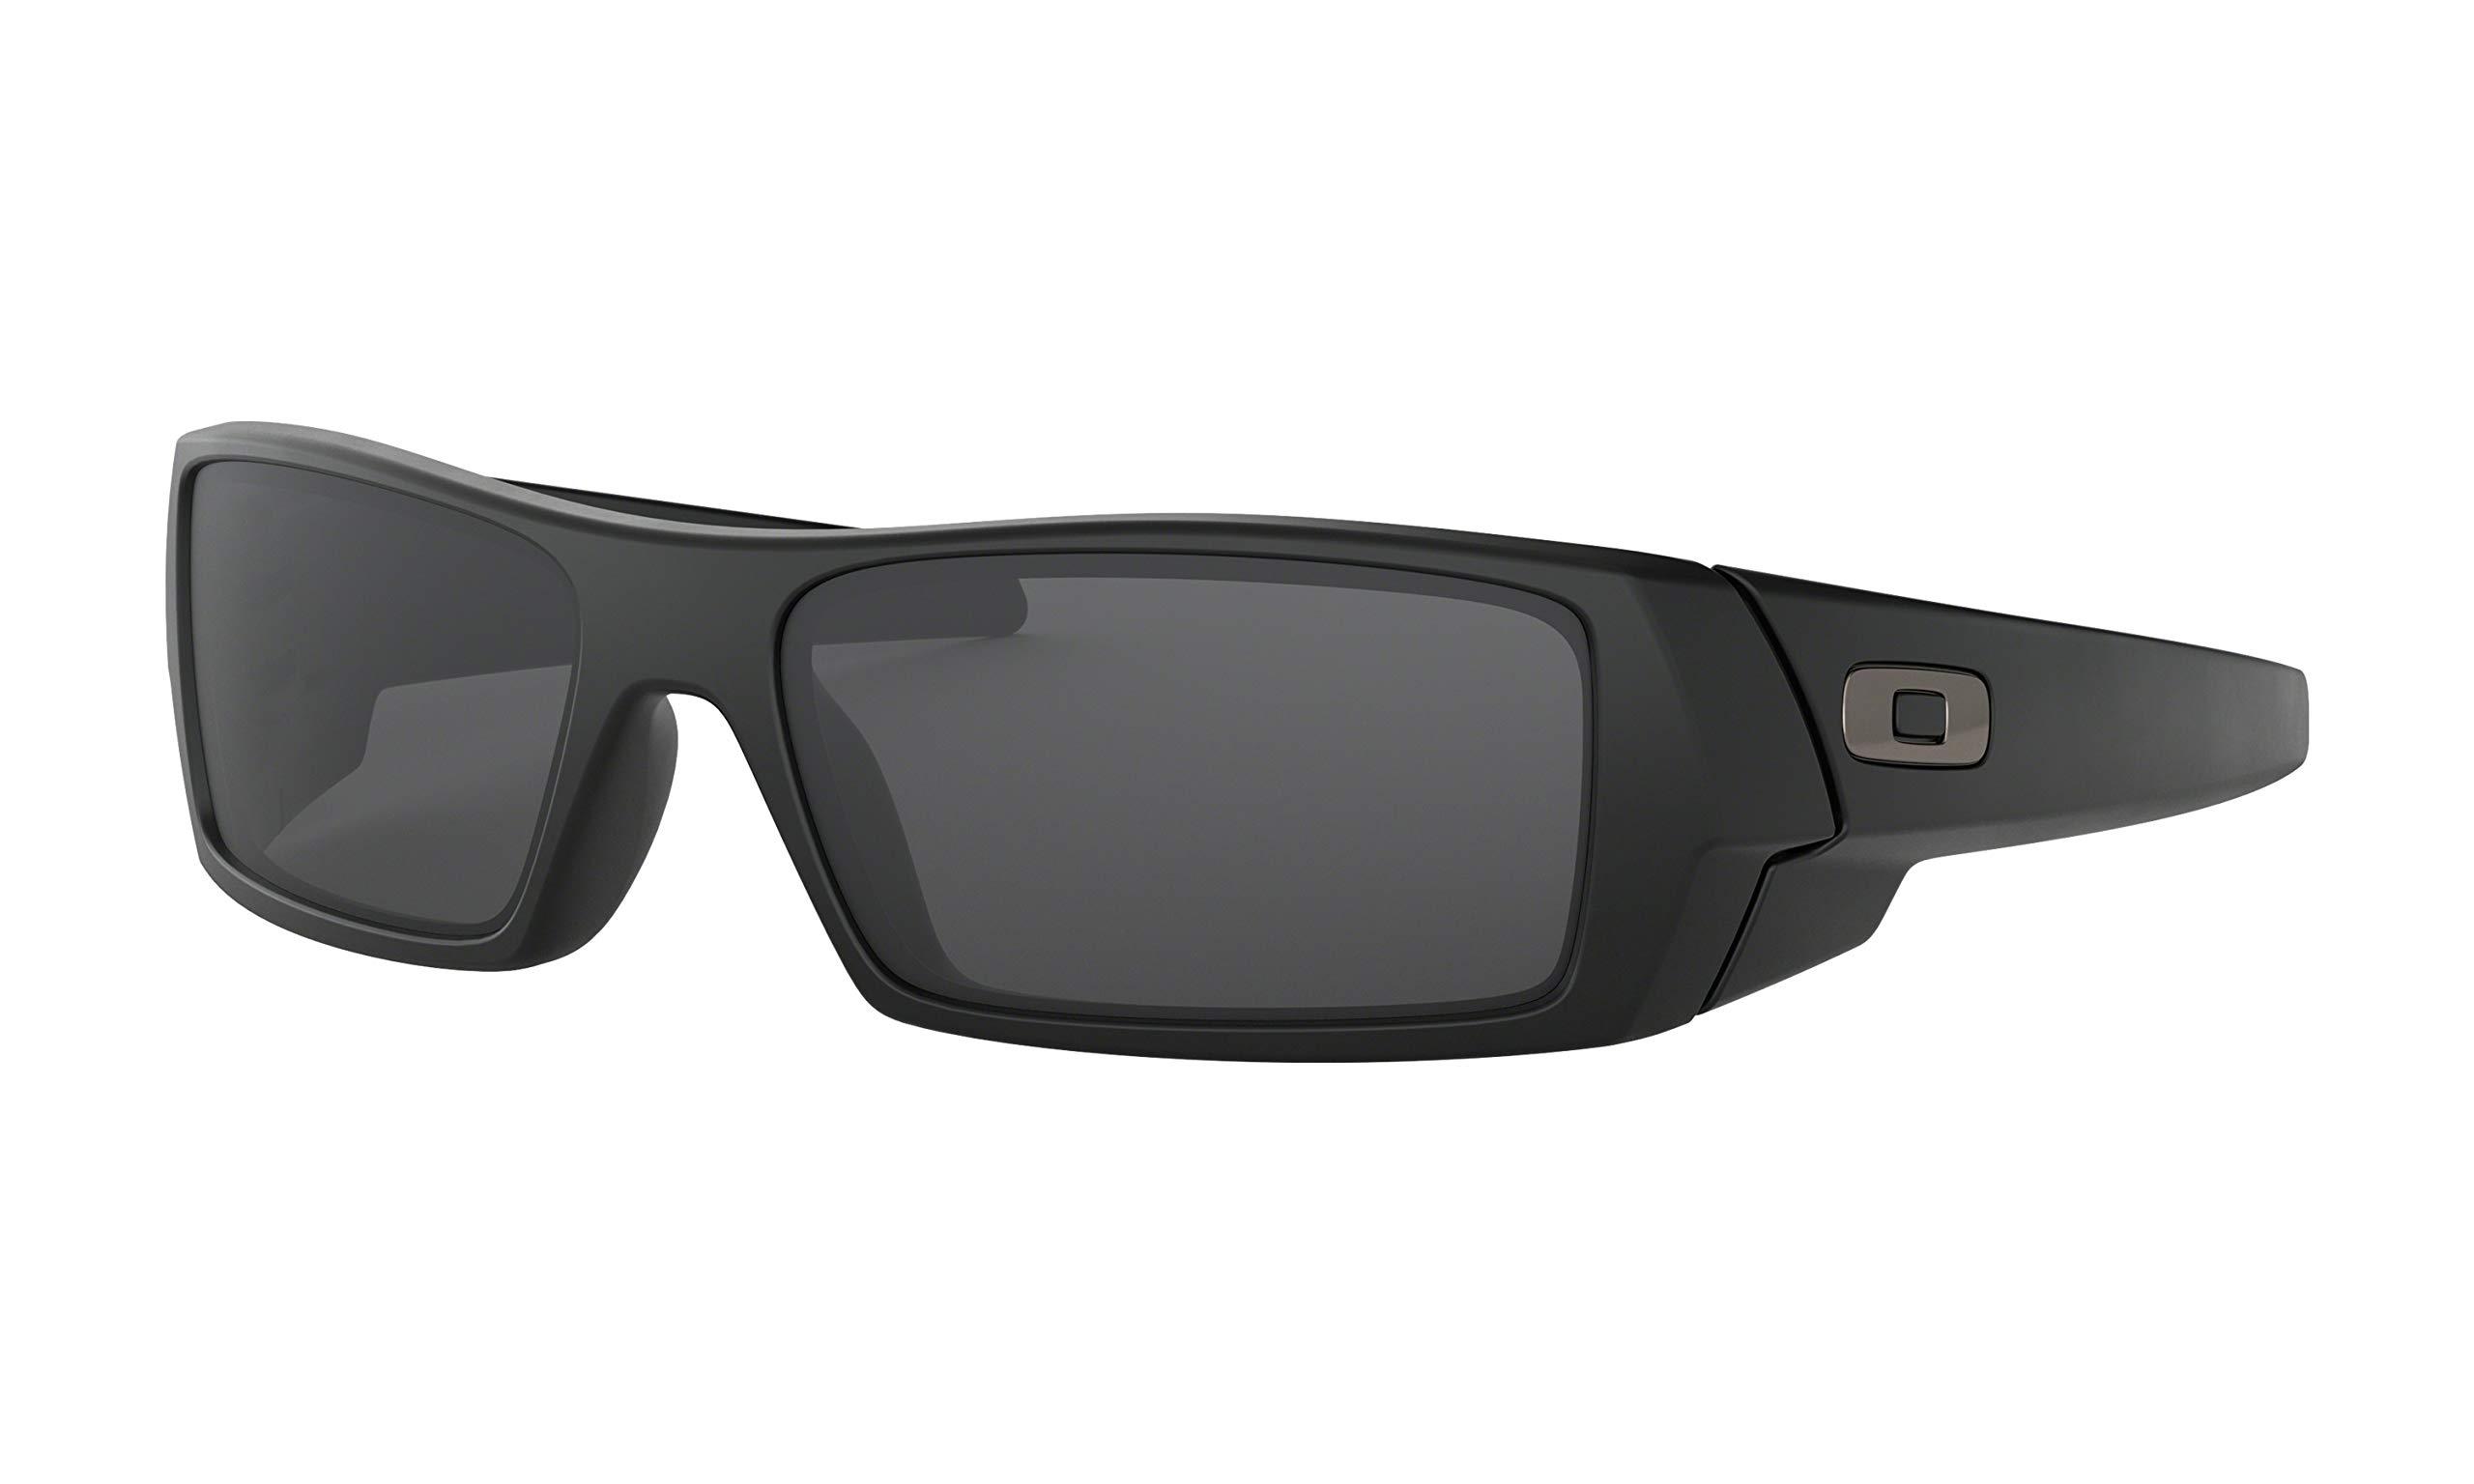 Oakley Gascan Suglasses Matte black with Grey Lens by Oakley